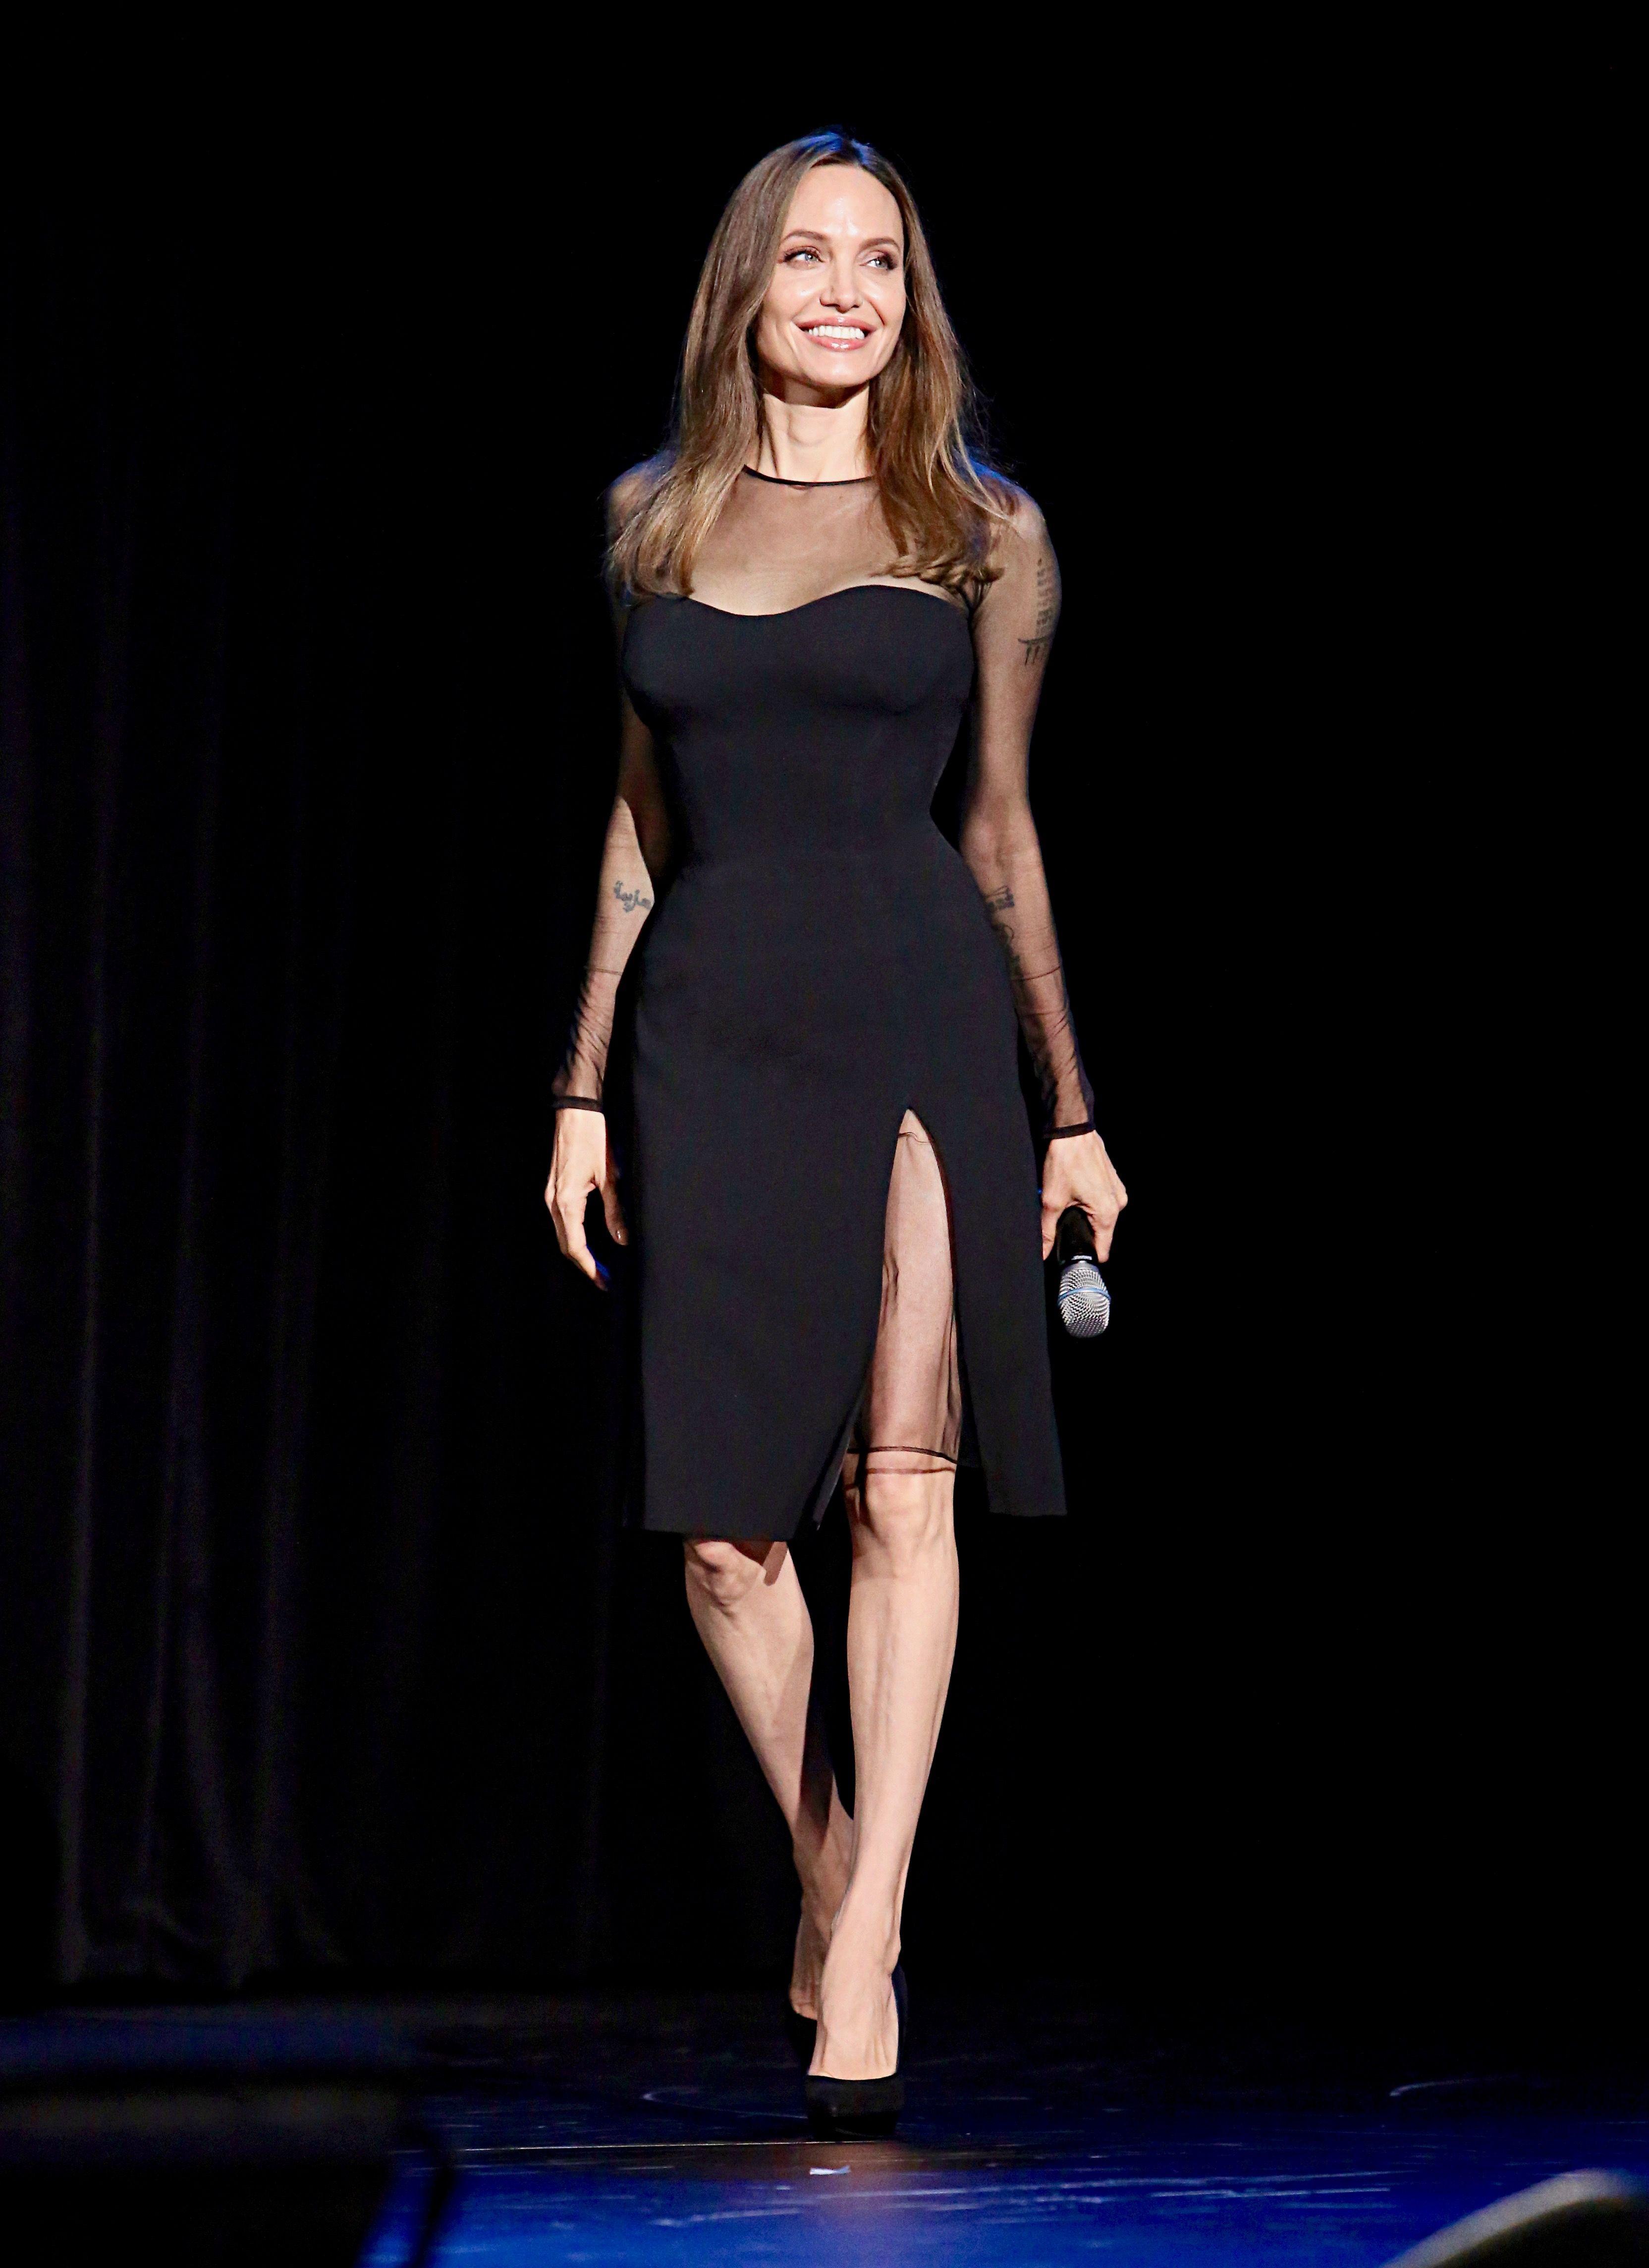 Angelina Jolie Naked Taking Lives angelina jolie's black magic for disney's d23 expo 2019 for